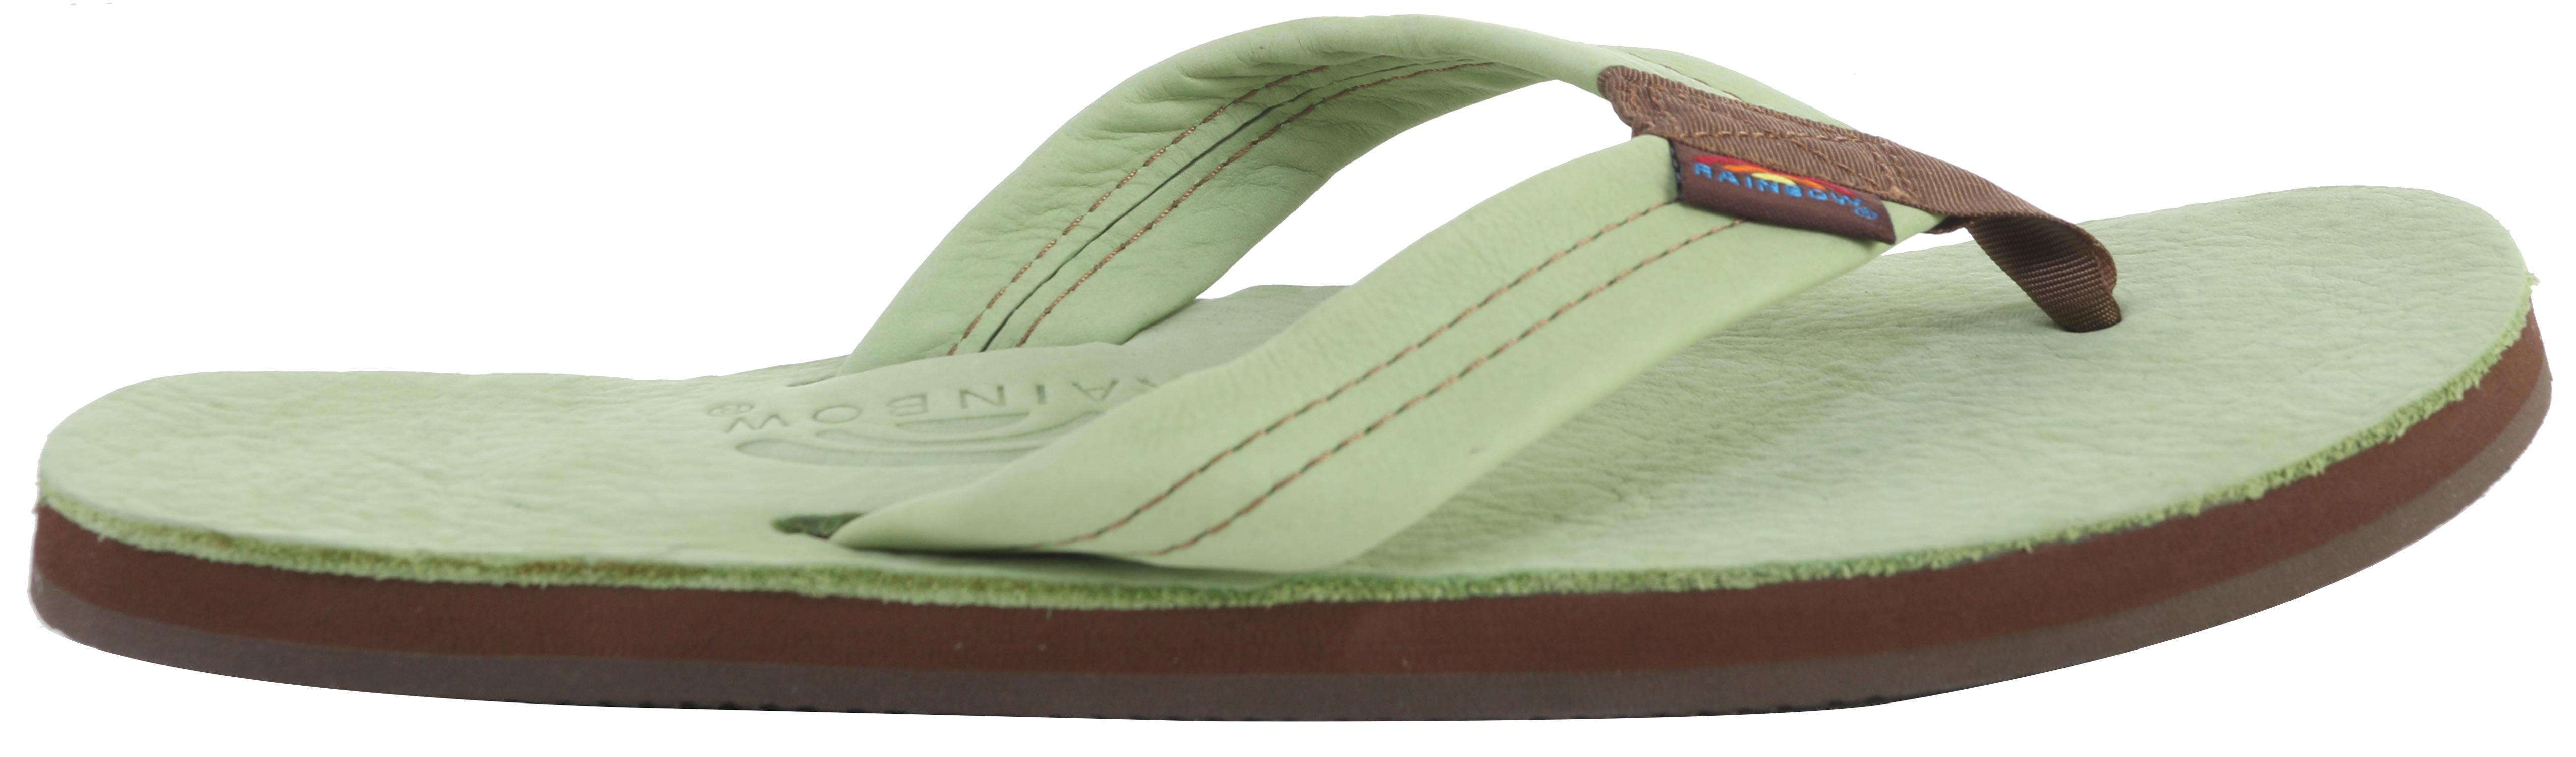 97f0b63e575 Rainbow Premier Leather Ns Sandals - thumbnail 1